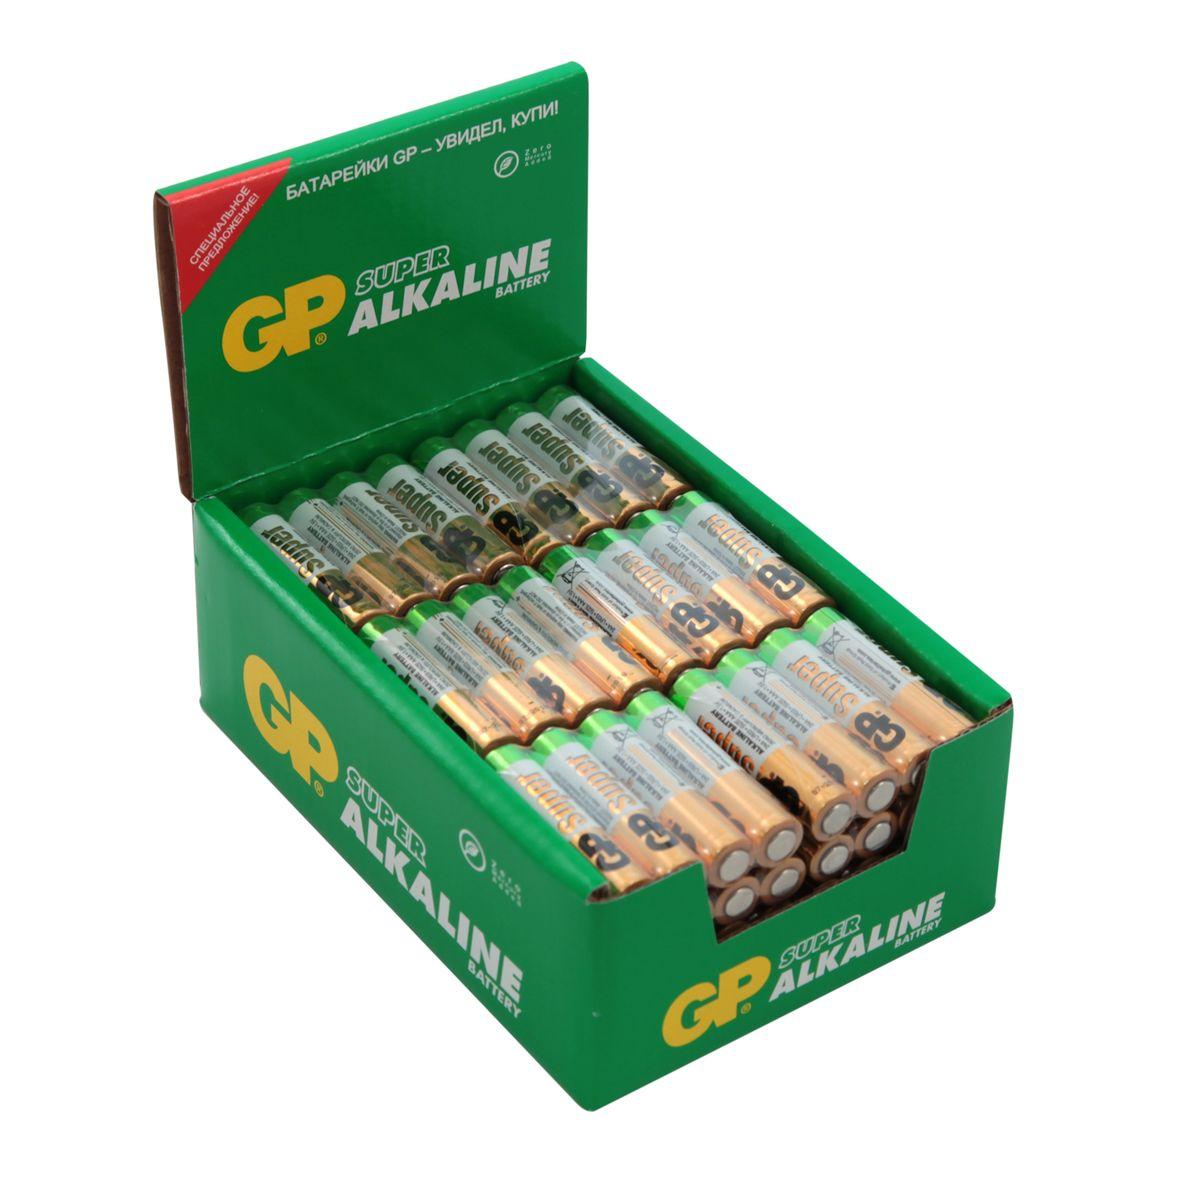 Батарейка алкалиновая GP Batteries Super Alkaline, тип ААА, 96 шт батарейка алкалиновая gp batteries super alkaline тип крона 9v